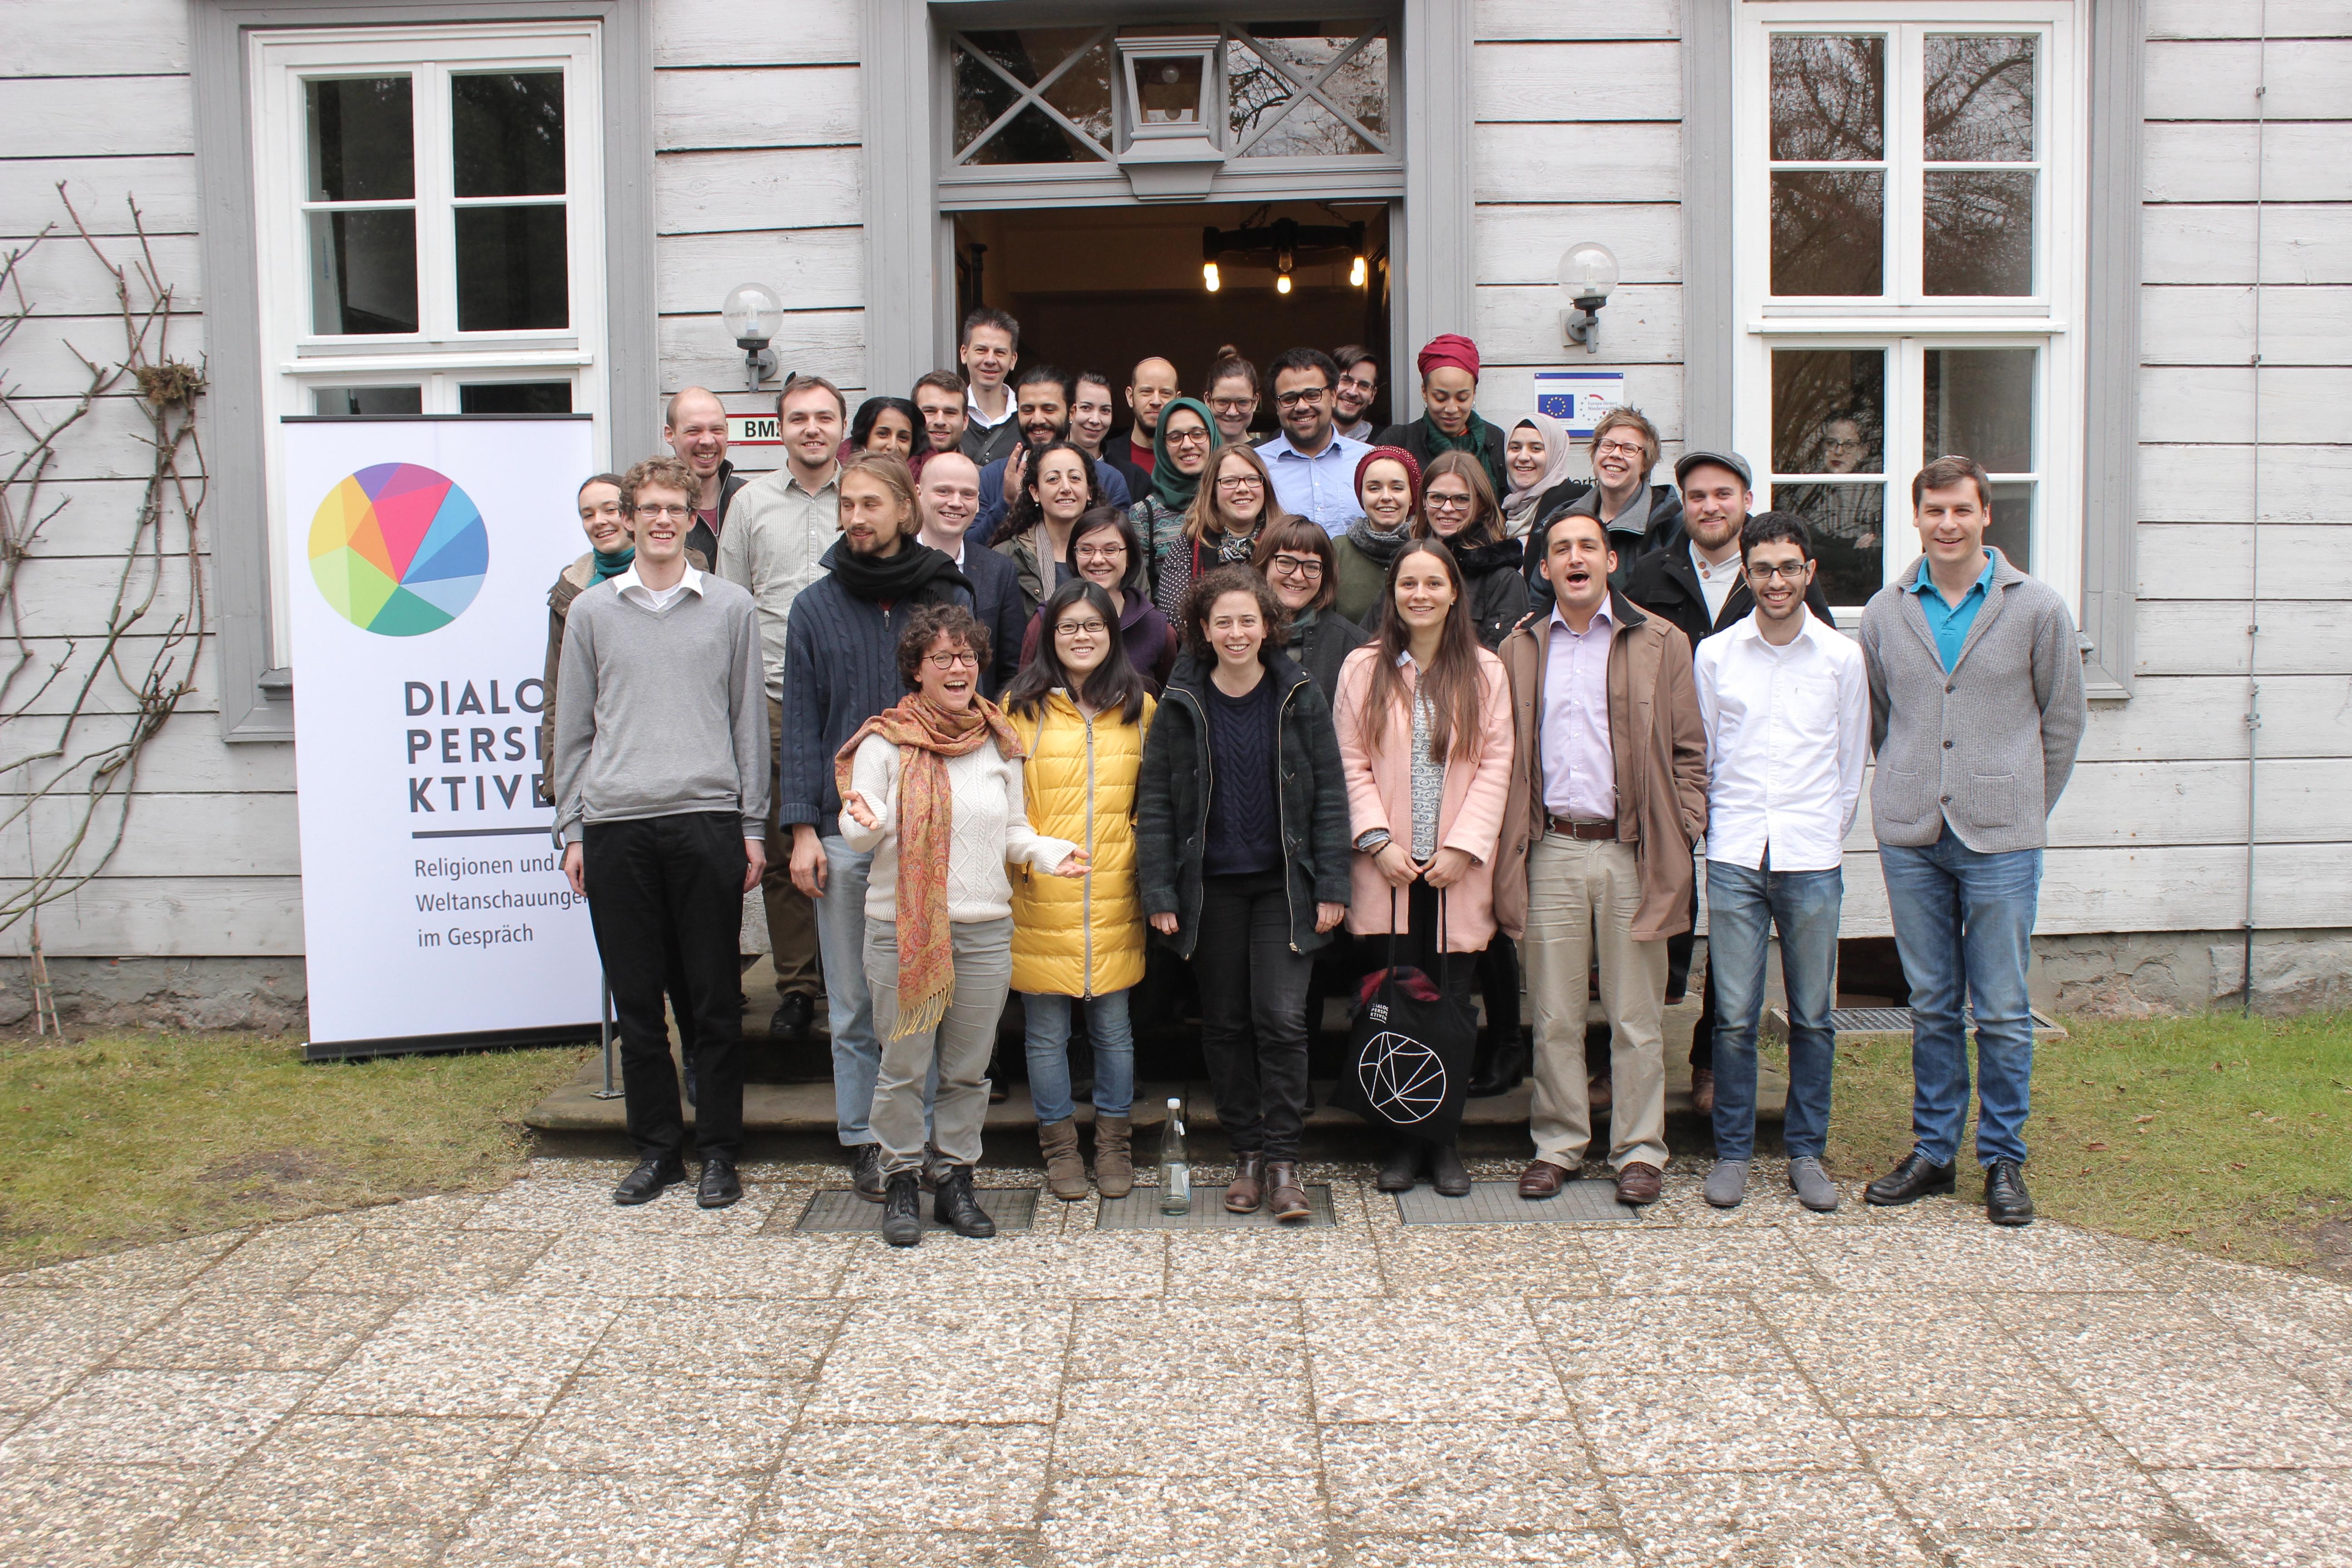 Gruppenbild der Teilnehmer_innen